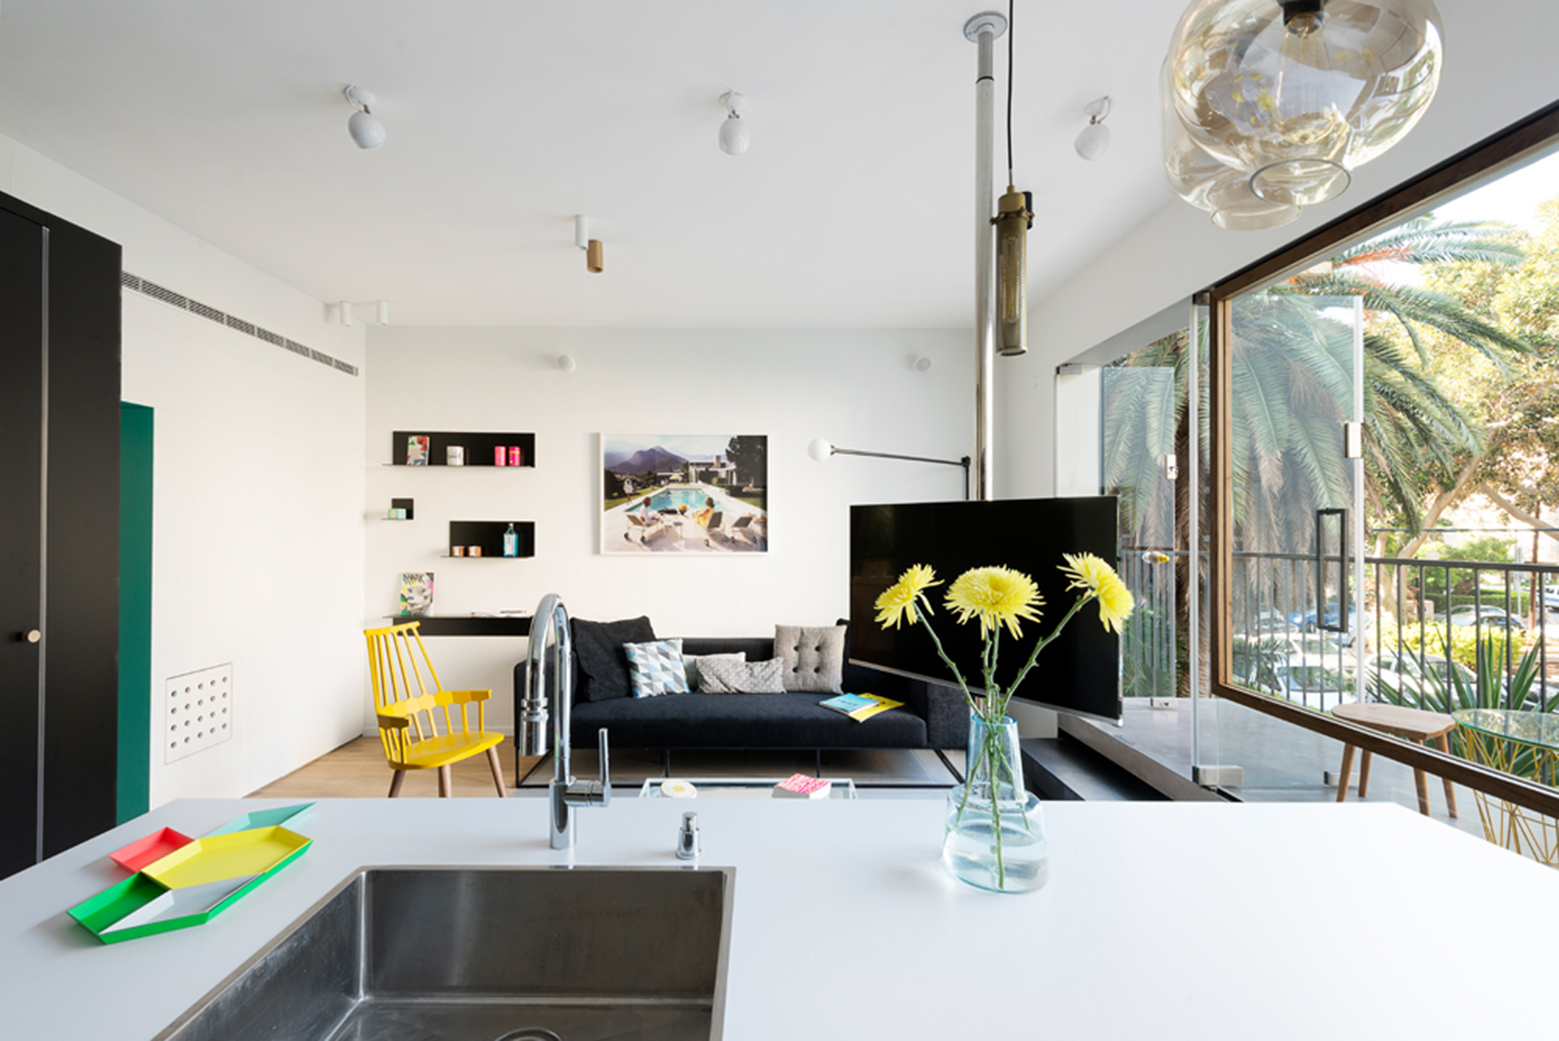 Apartment-in-Tel-Aviv-Small-Apartment-Maayan-Zusman-Interior-Design-Tel-Aviv-Living-Room-Humble-Homes